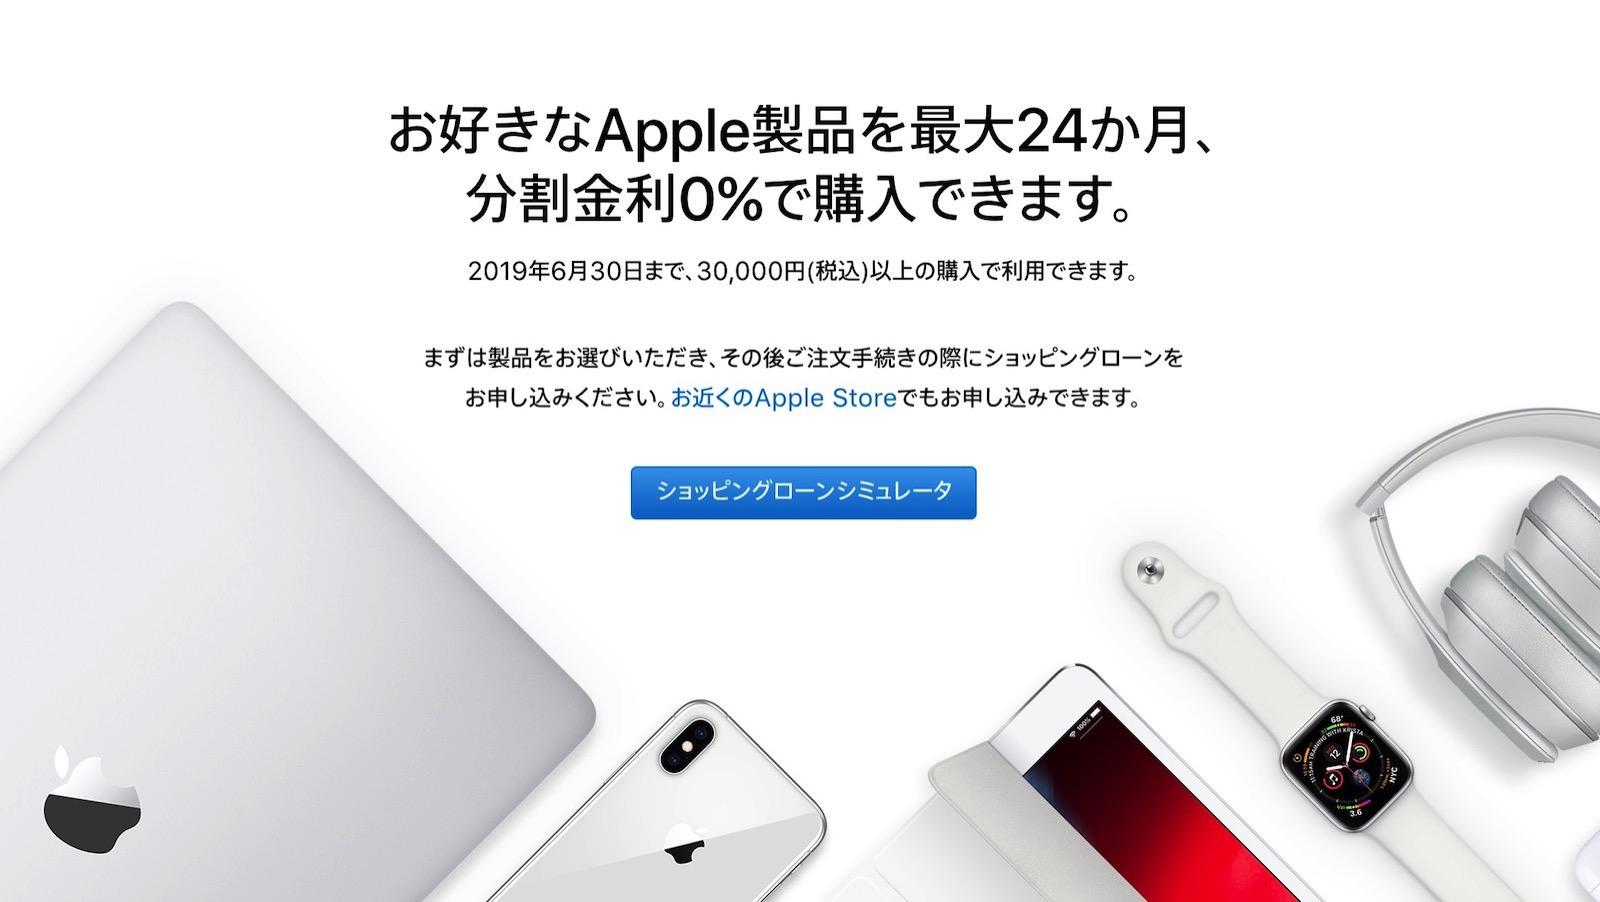 Apple-Financing-Extended-to-June2019.jpg